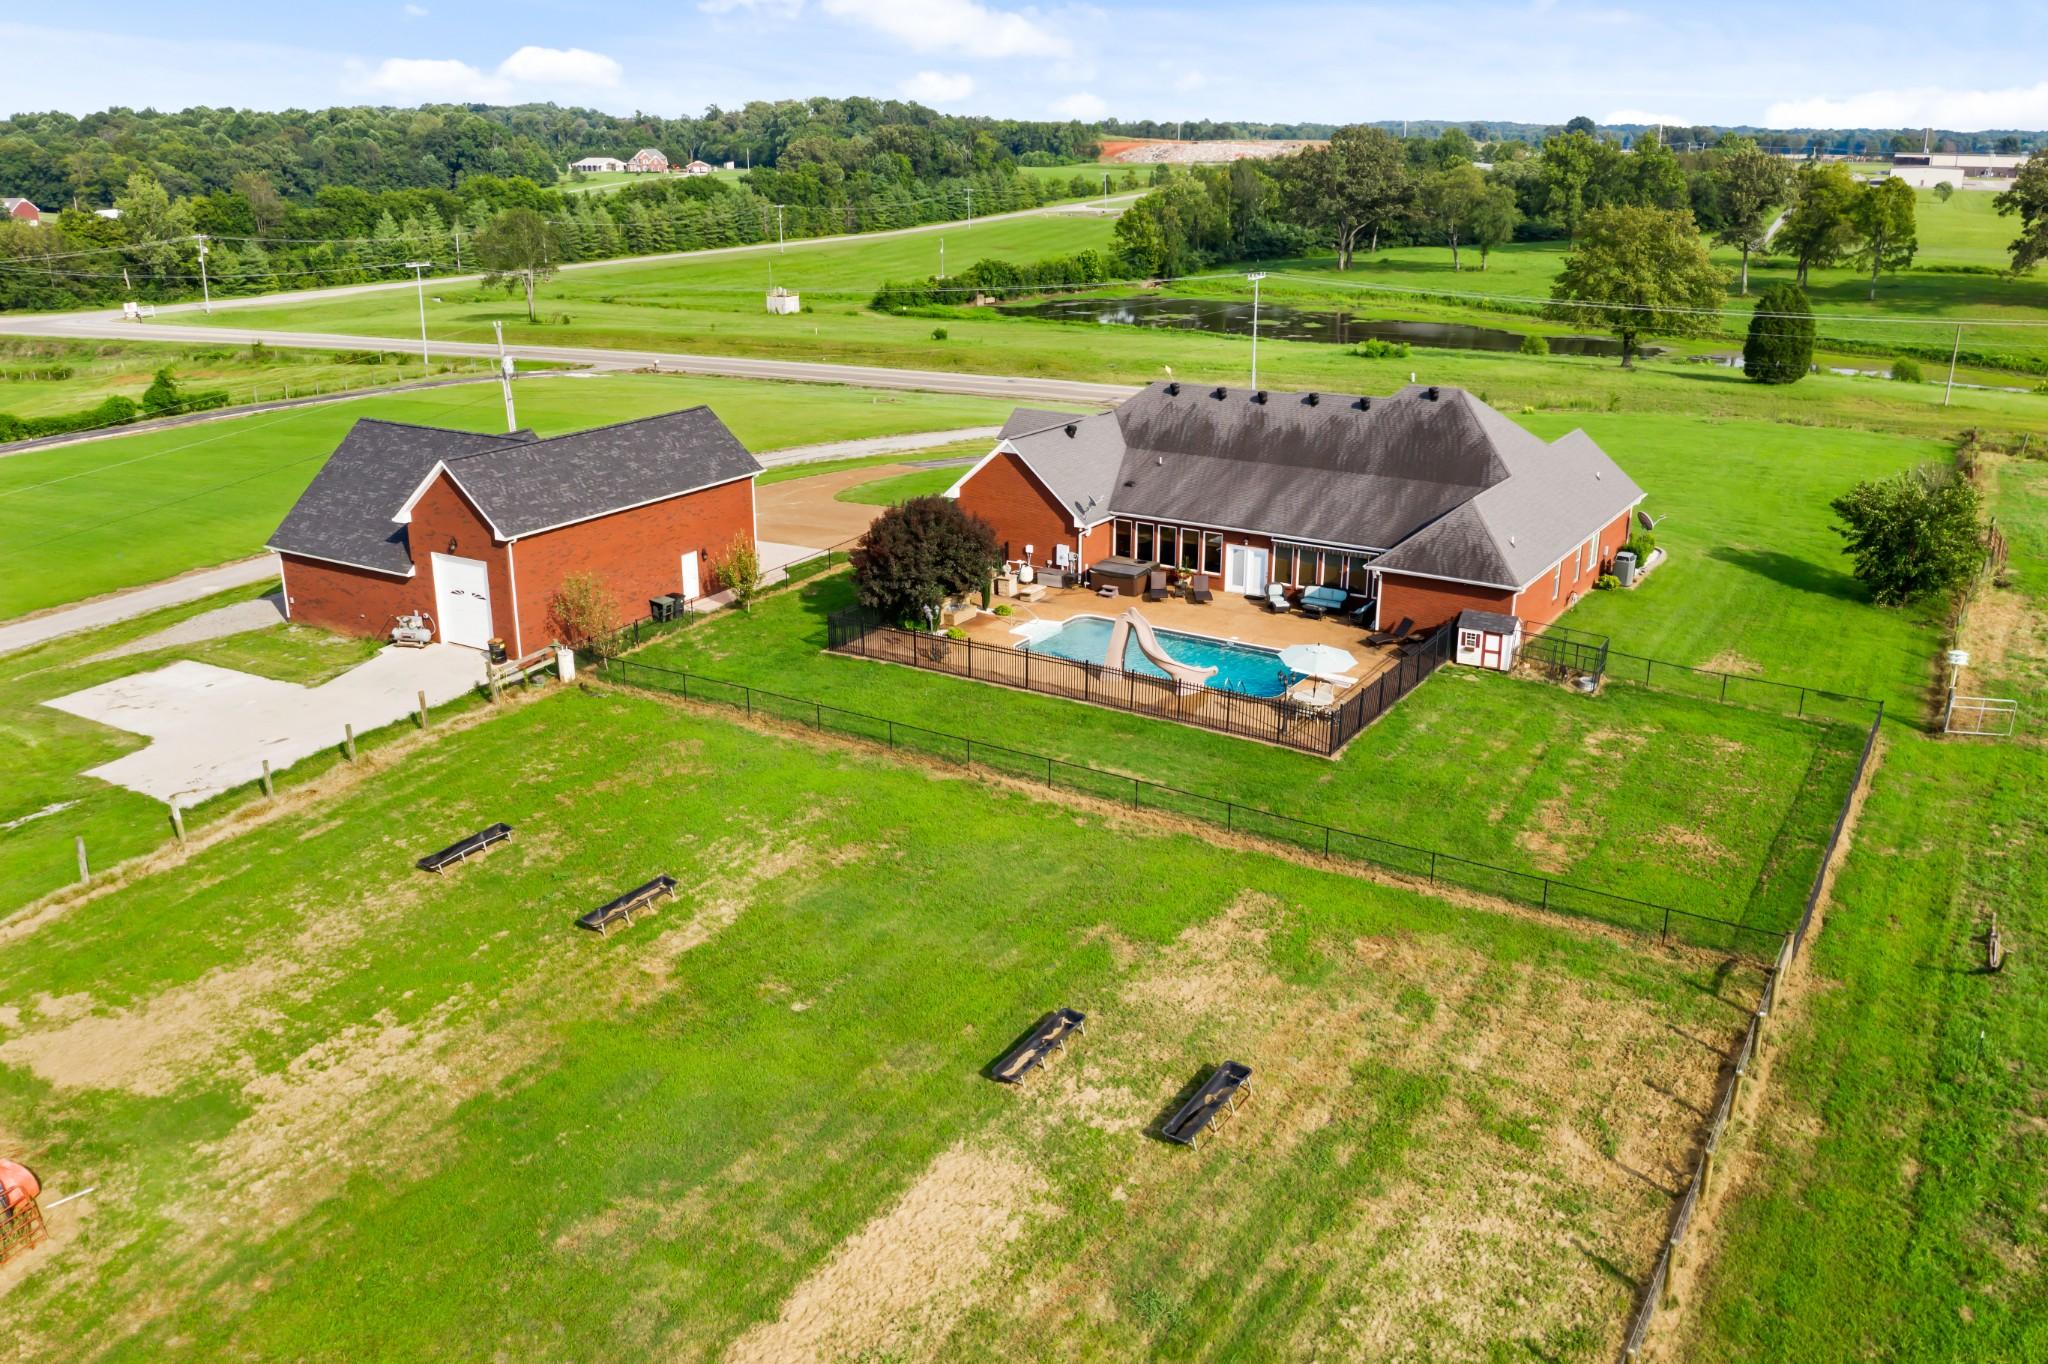 4658 Guthrie Hwy, Clarksville, TN 37040 - Clarksville, TN real estate listing